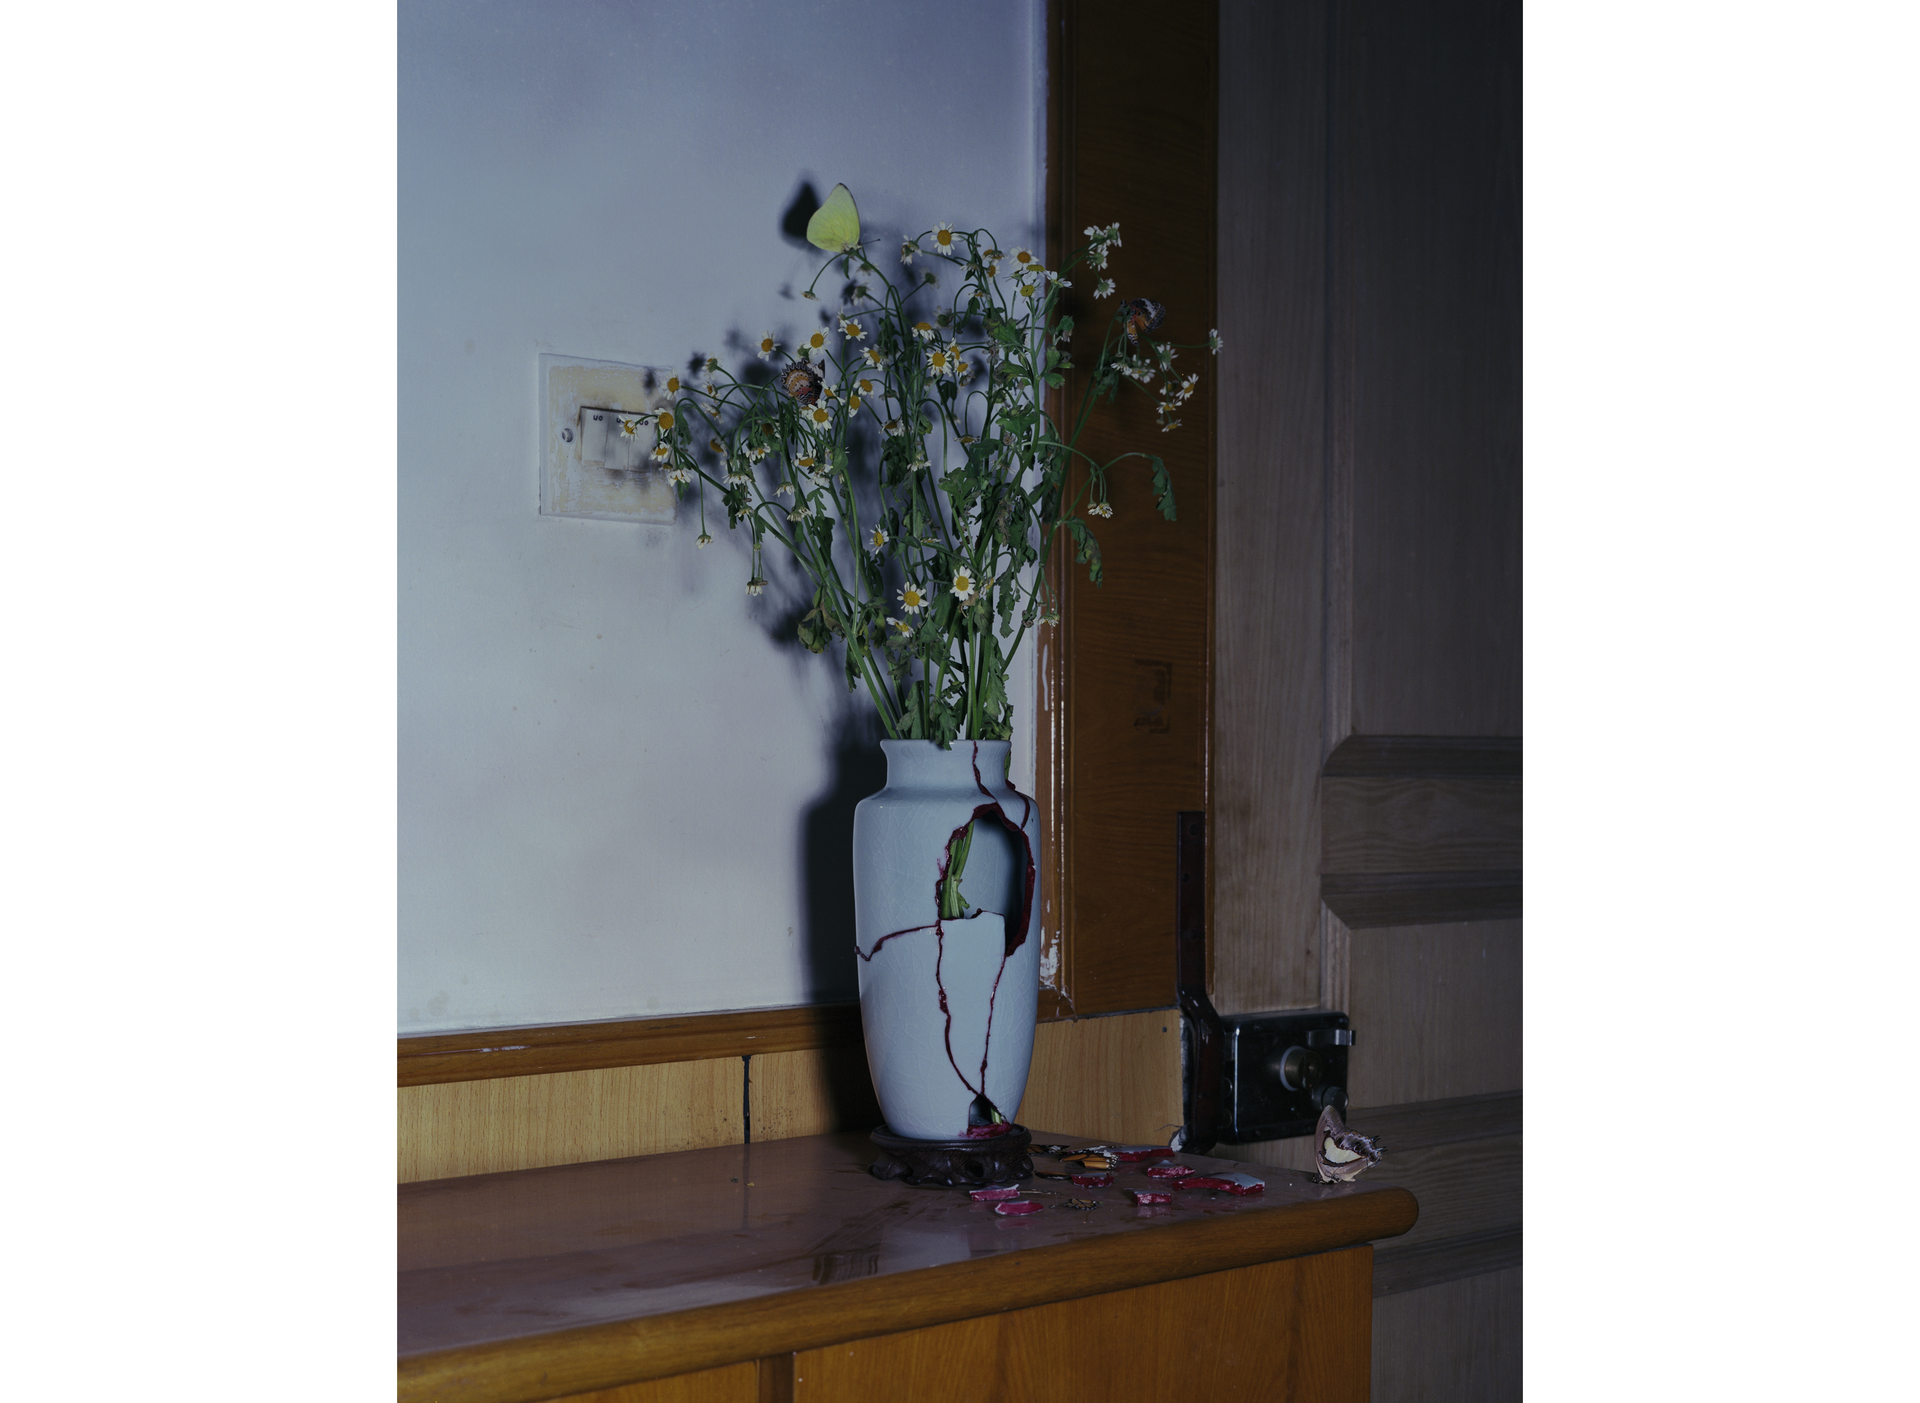 """The broken vase(China),2020"""